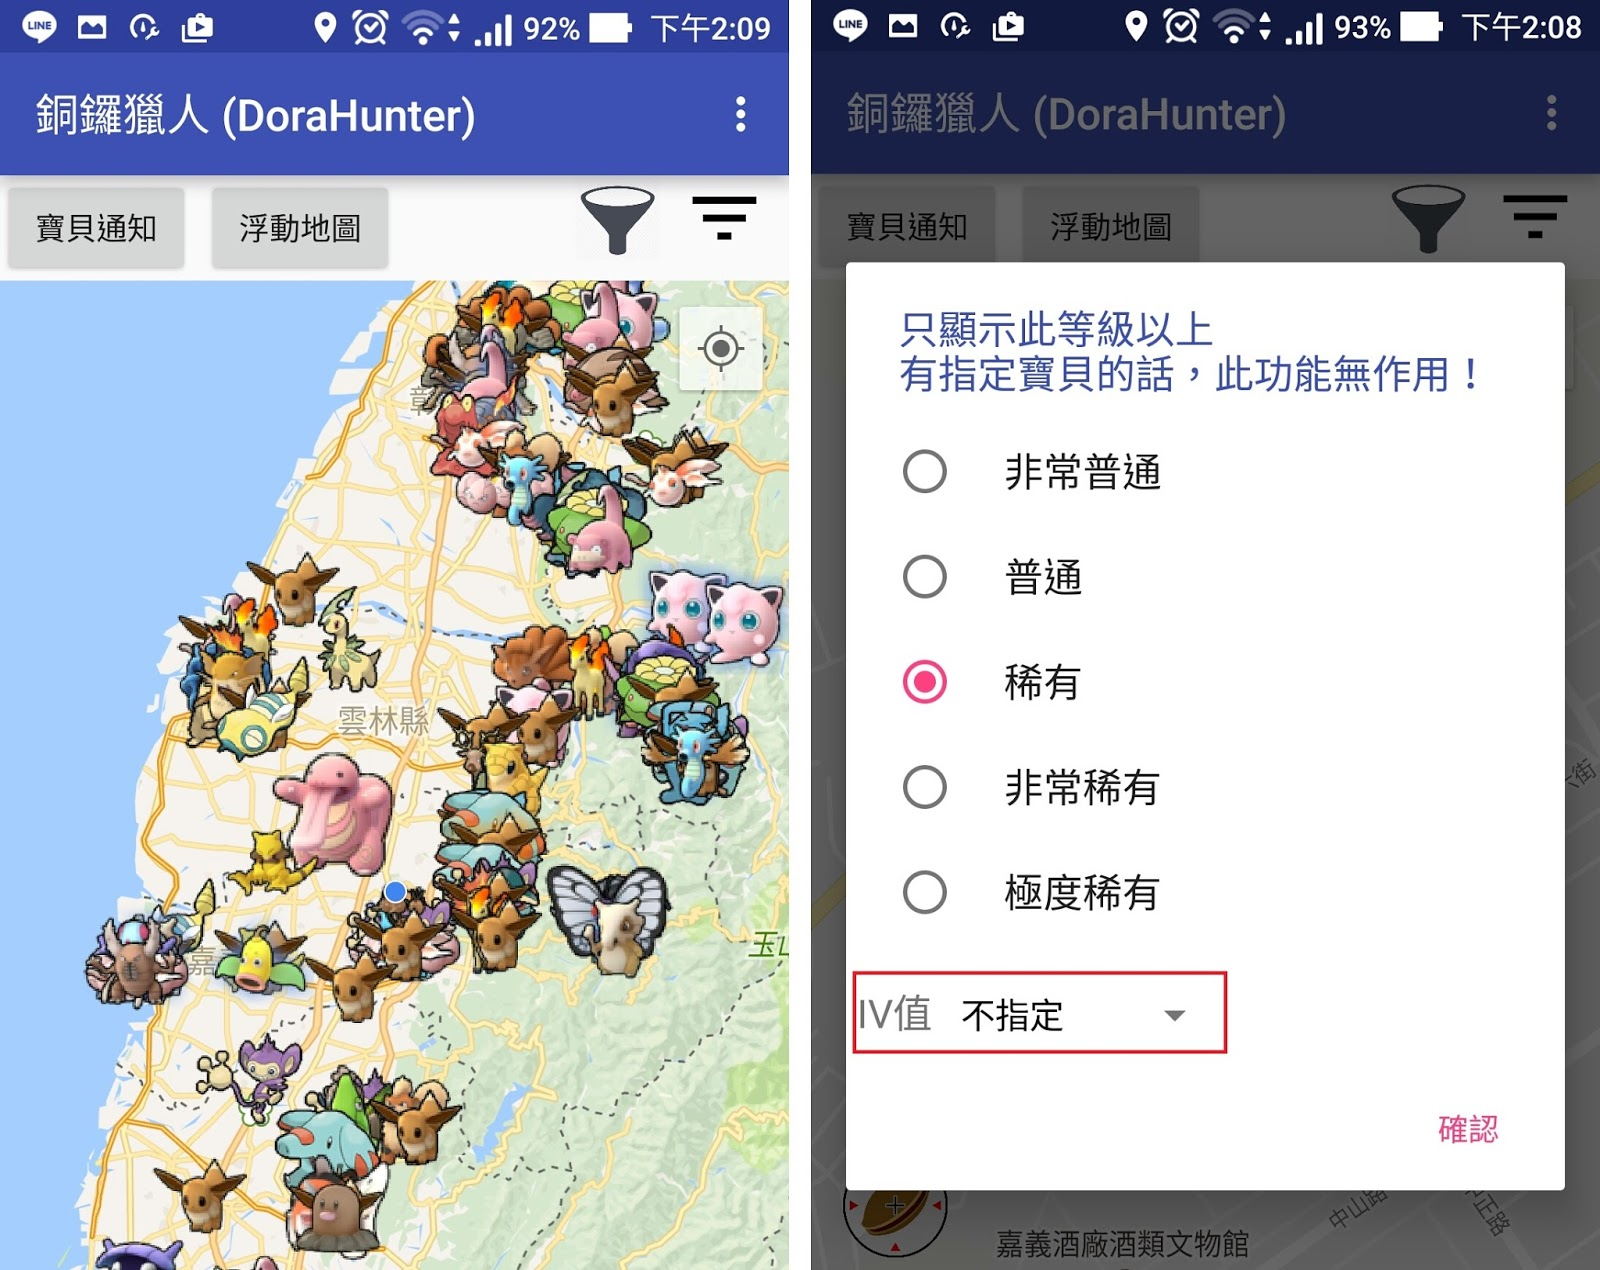 Screenshot 20170225 140940 - DoraHunter 銅鑼獵人 - 02/24 最新的寶可夢雷達,支援第二代寶可夢,可顯示寶可夢出現的地點與時間